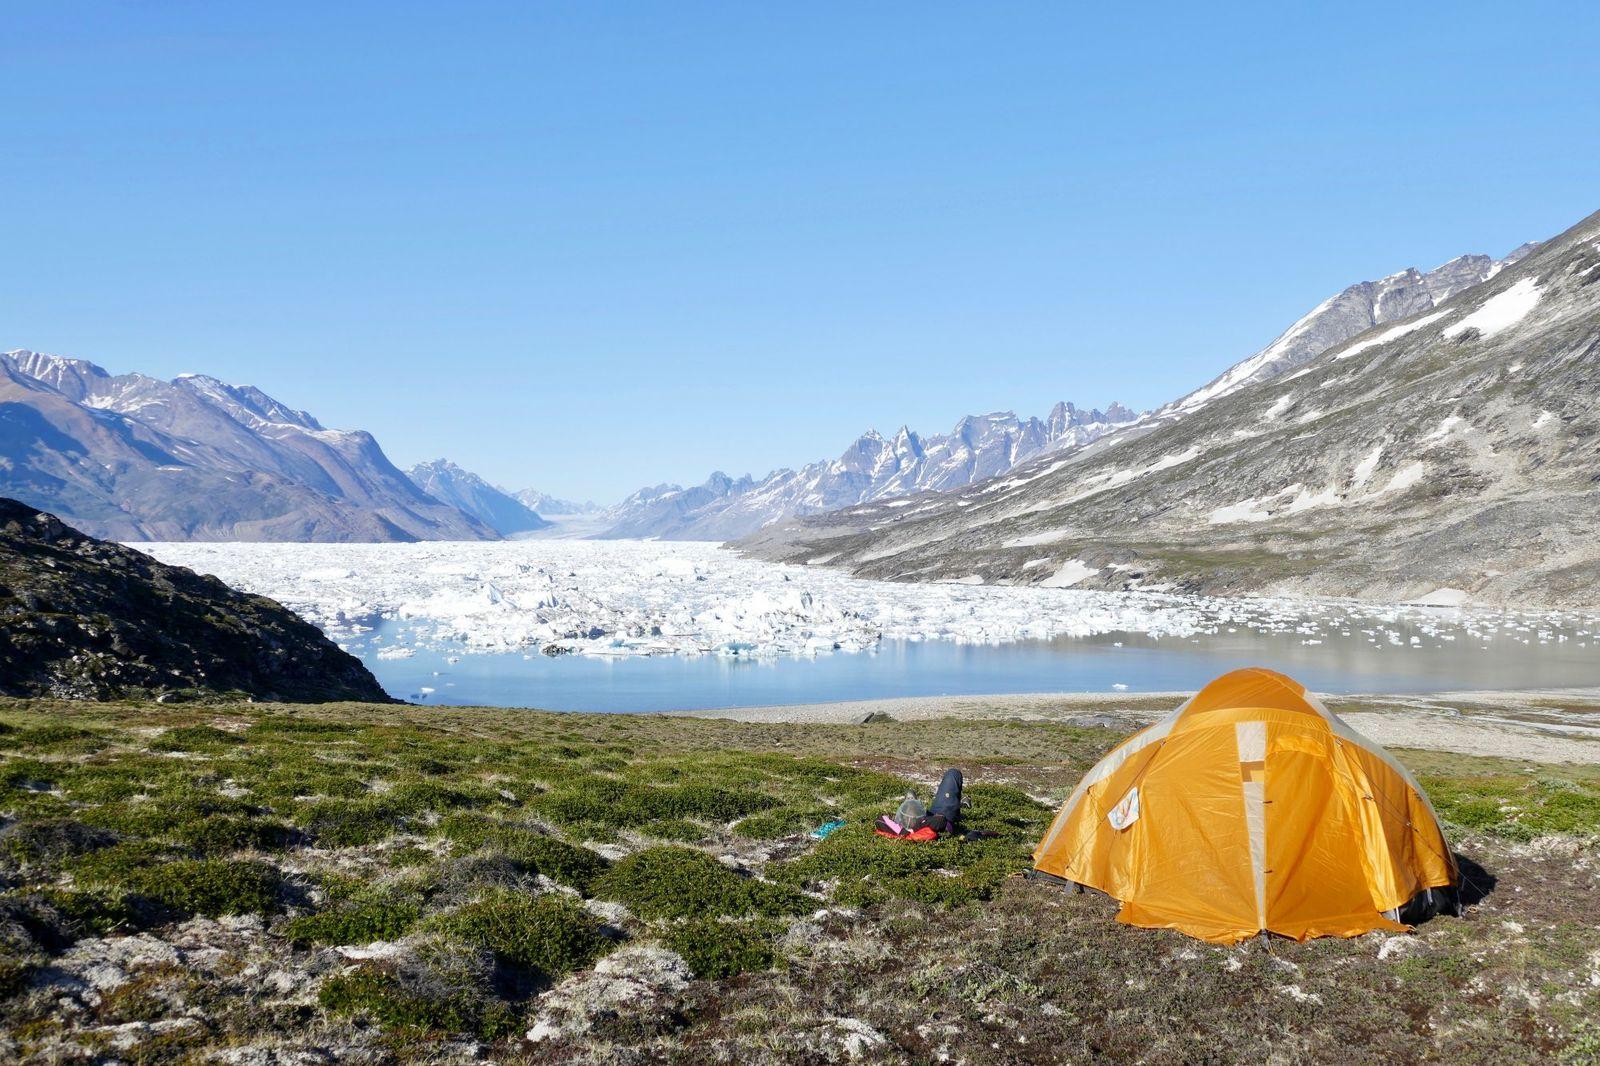 Hauser_ groenland-wildniscamp-ningerte-glk20